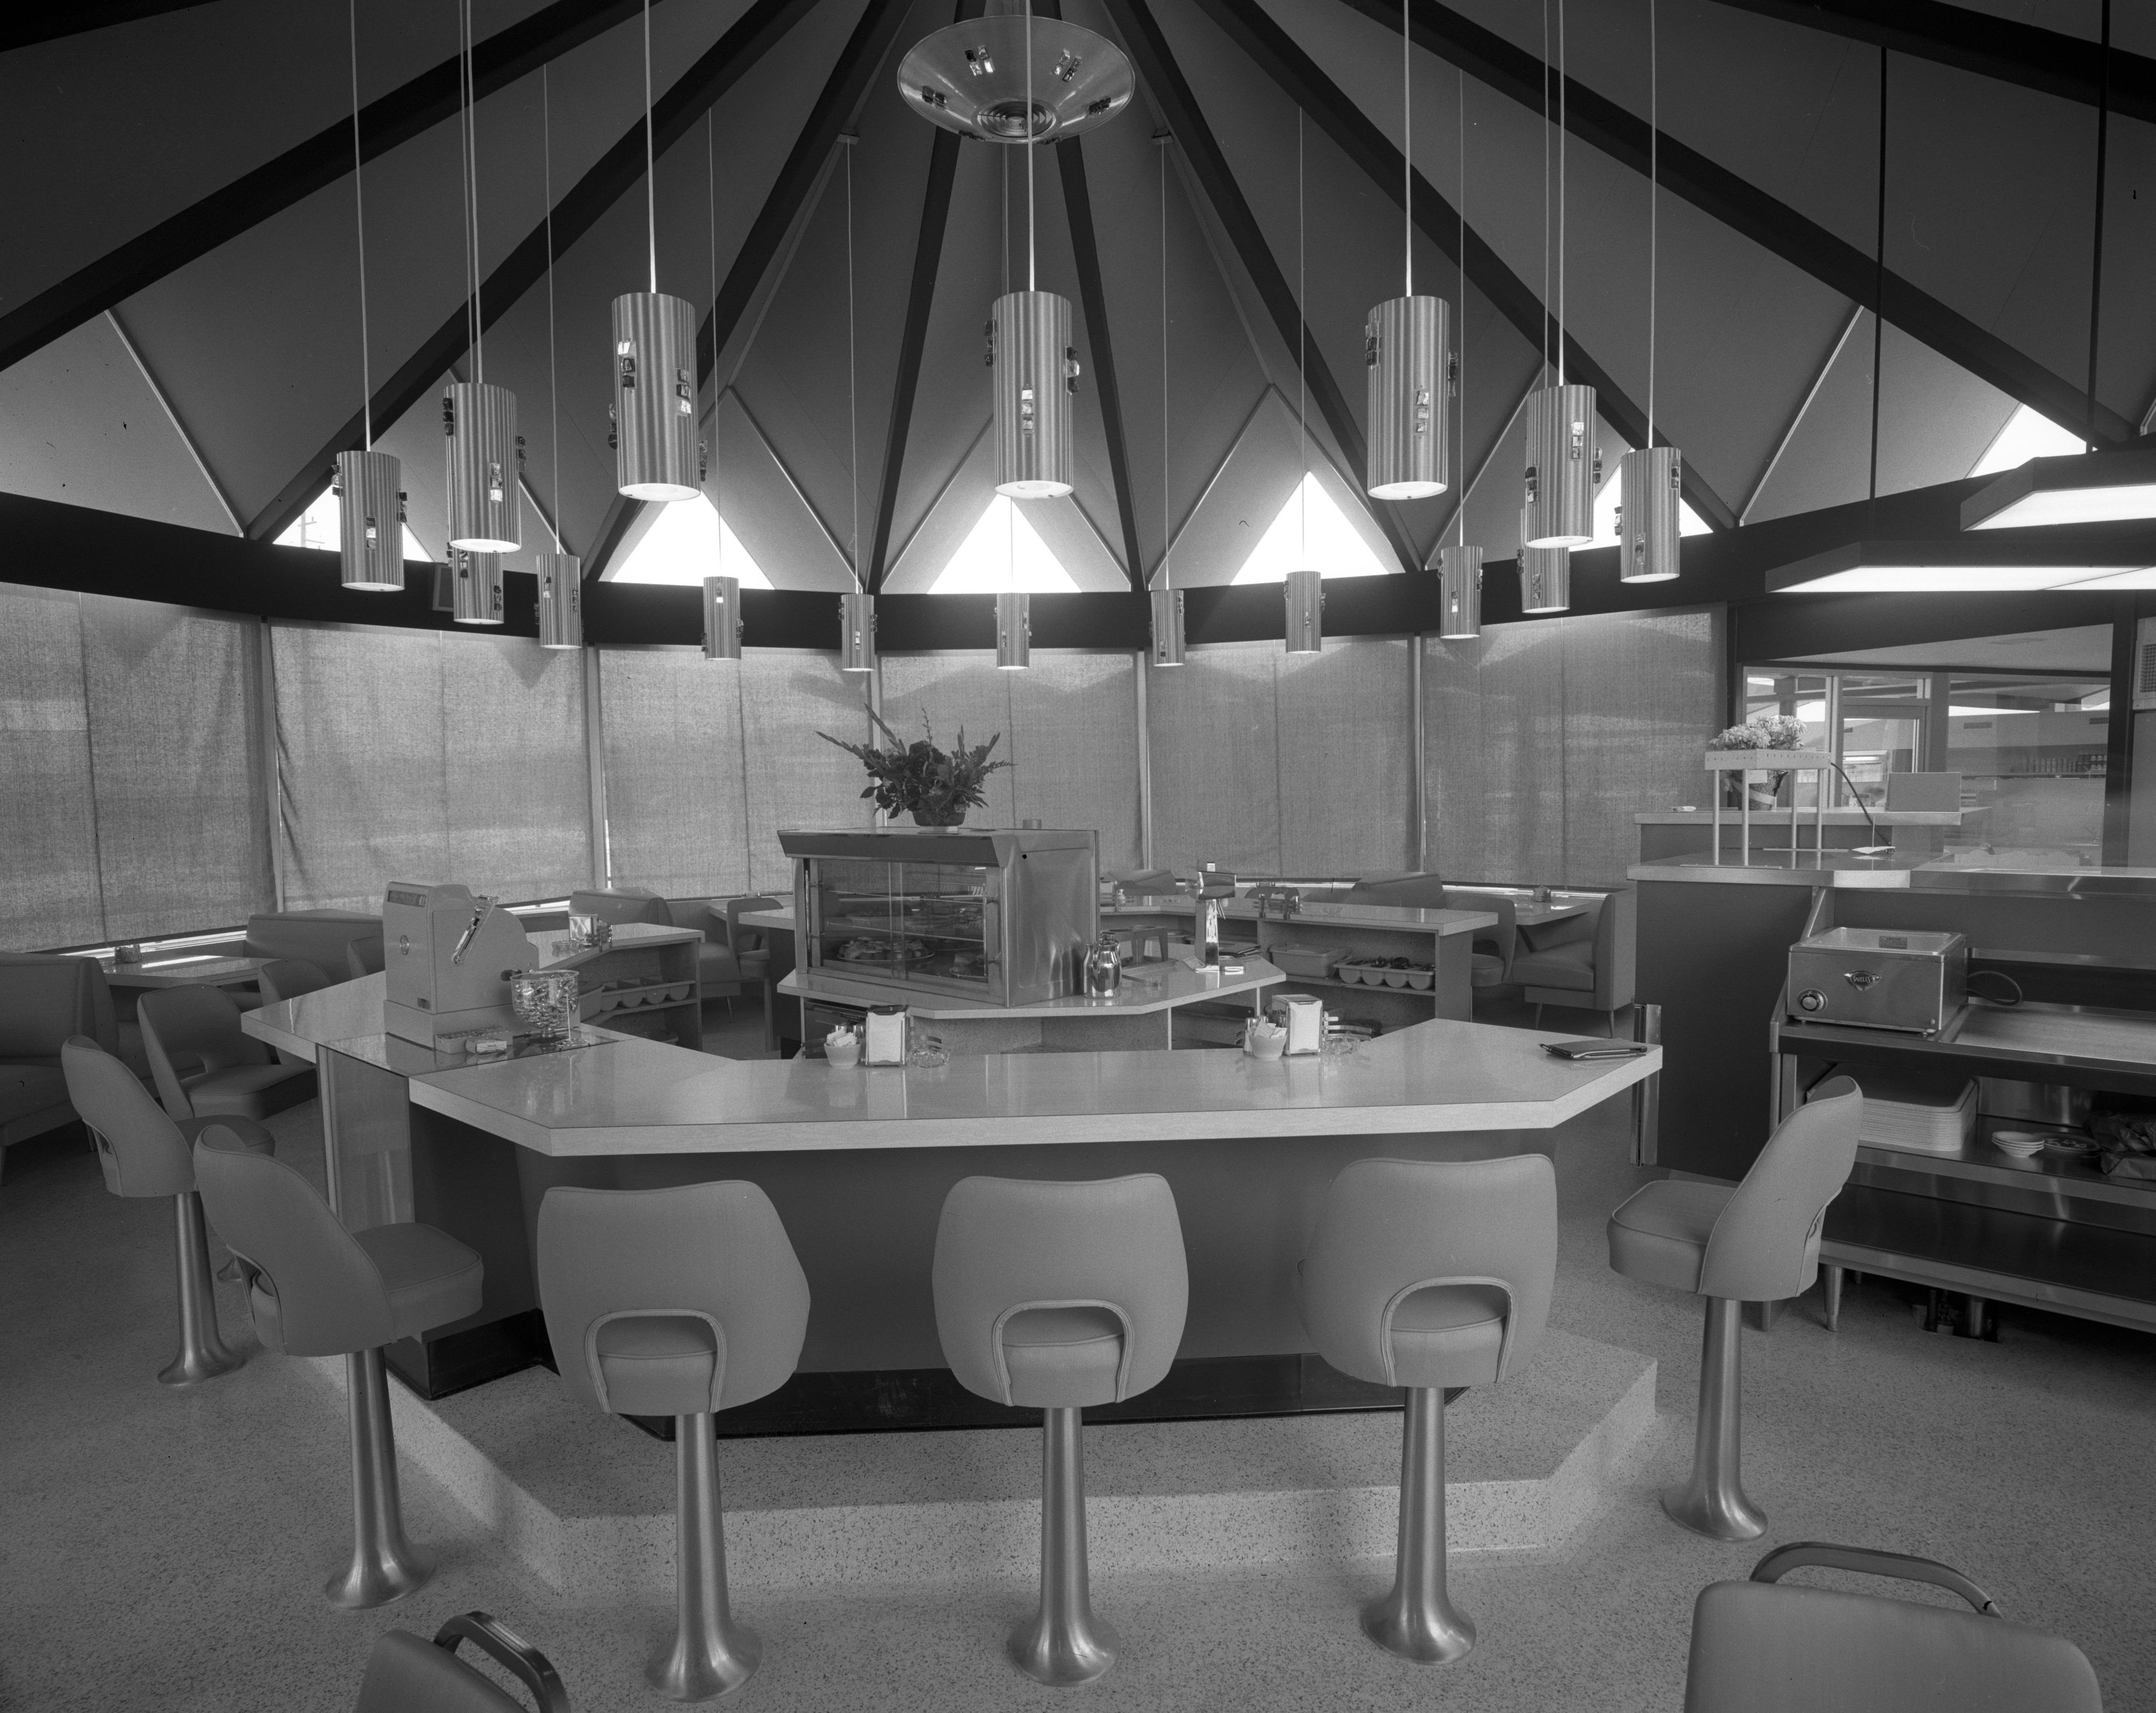 New Bolgos Restaurant At 3535 Plymouth Rd April 1965